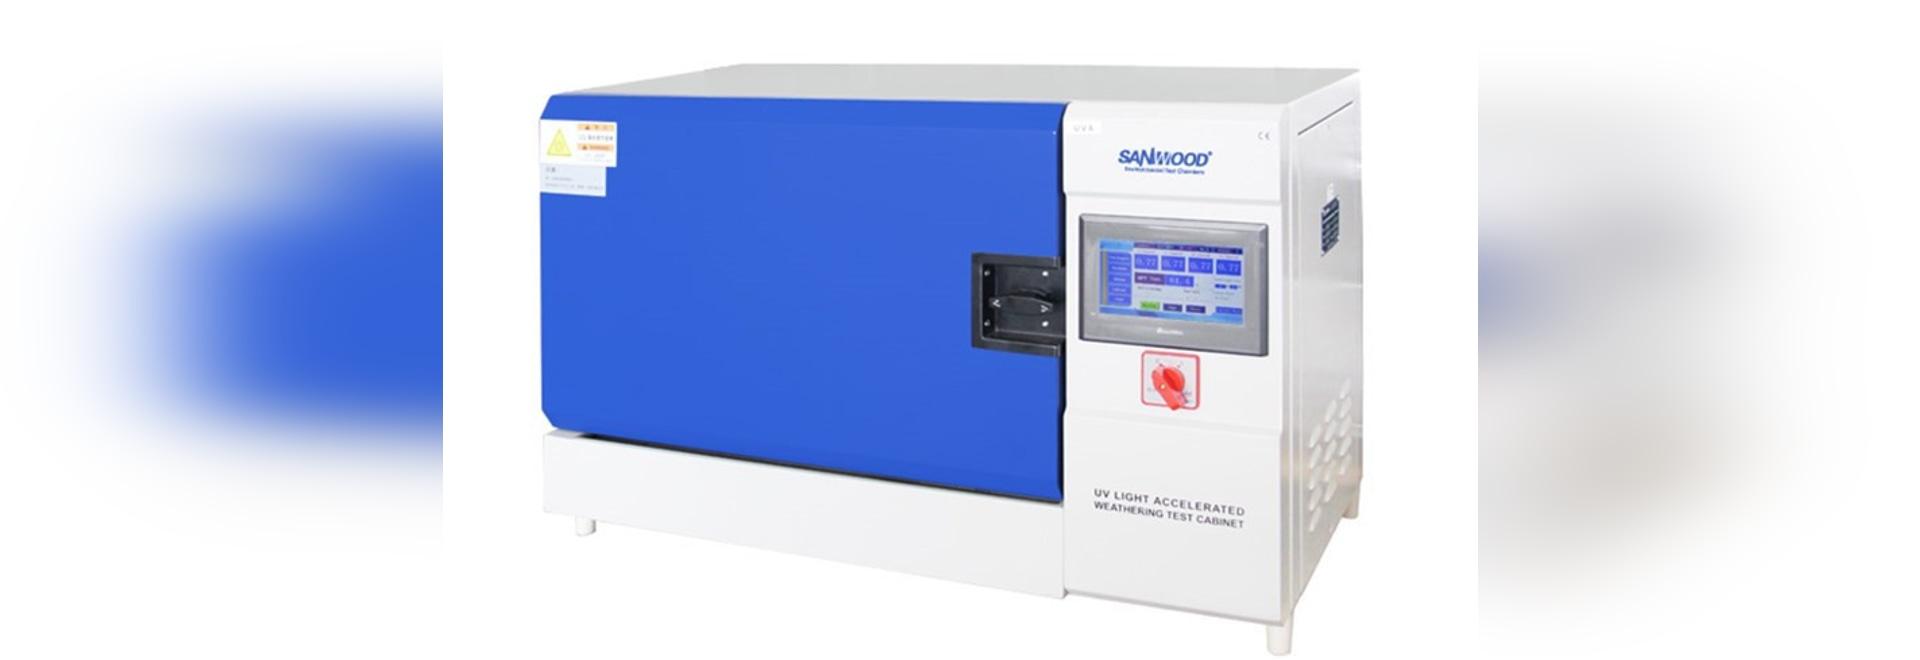 Bench-top UV test chamber